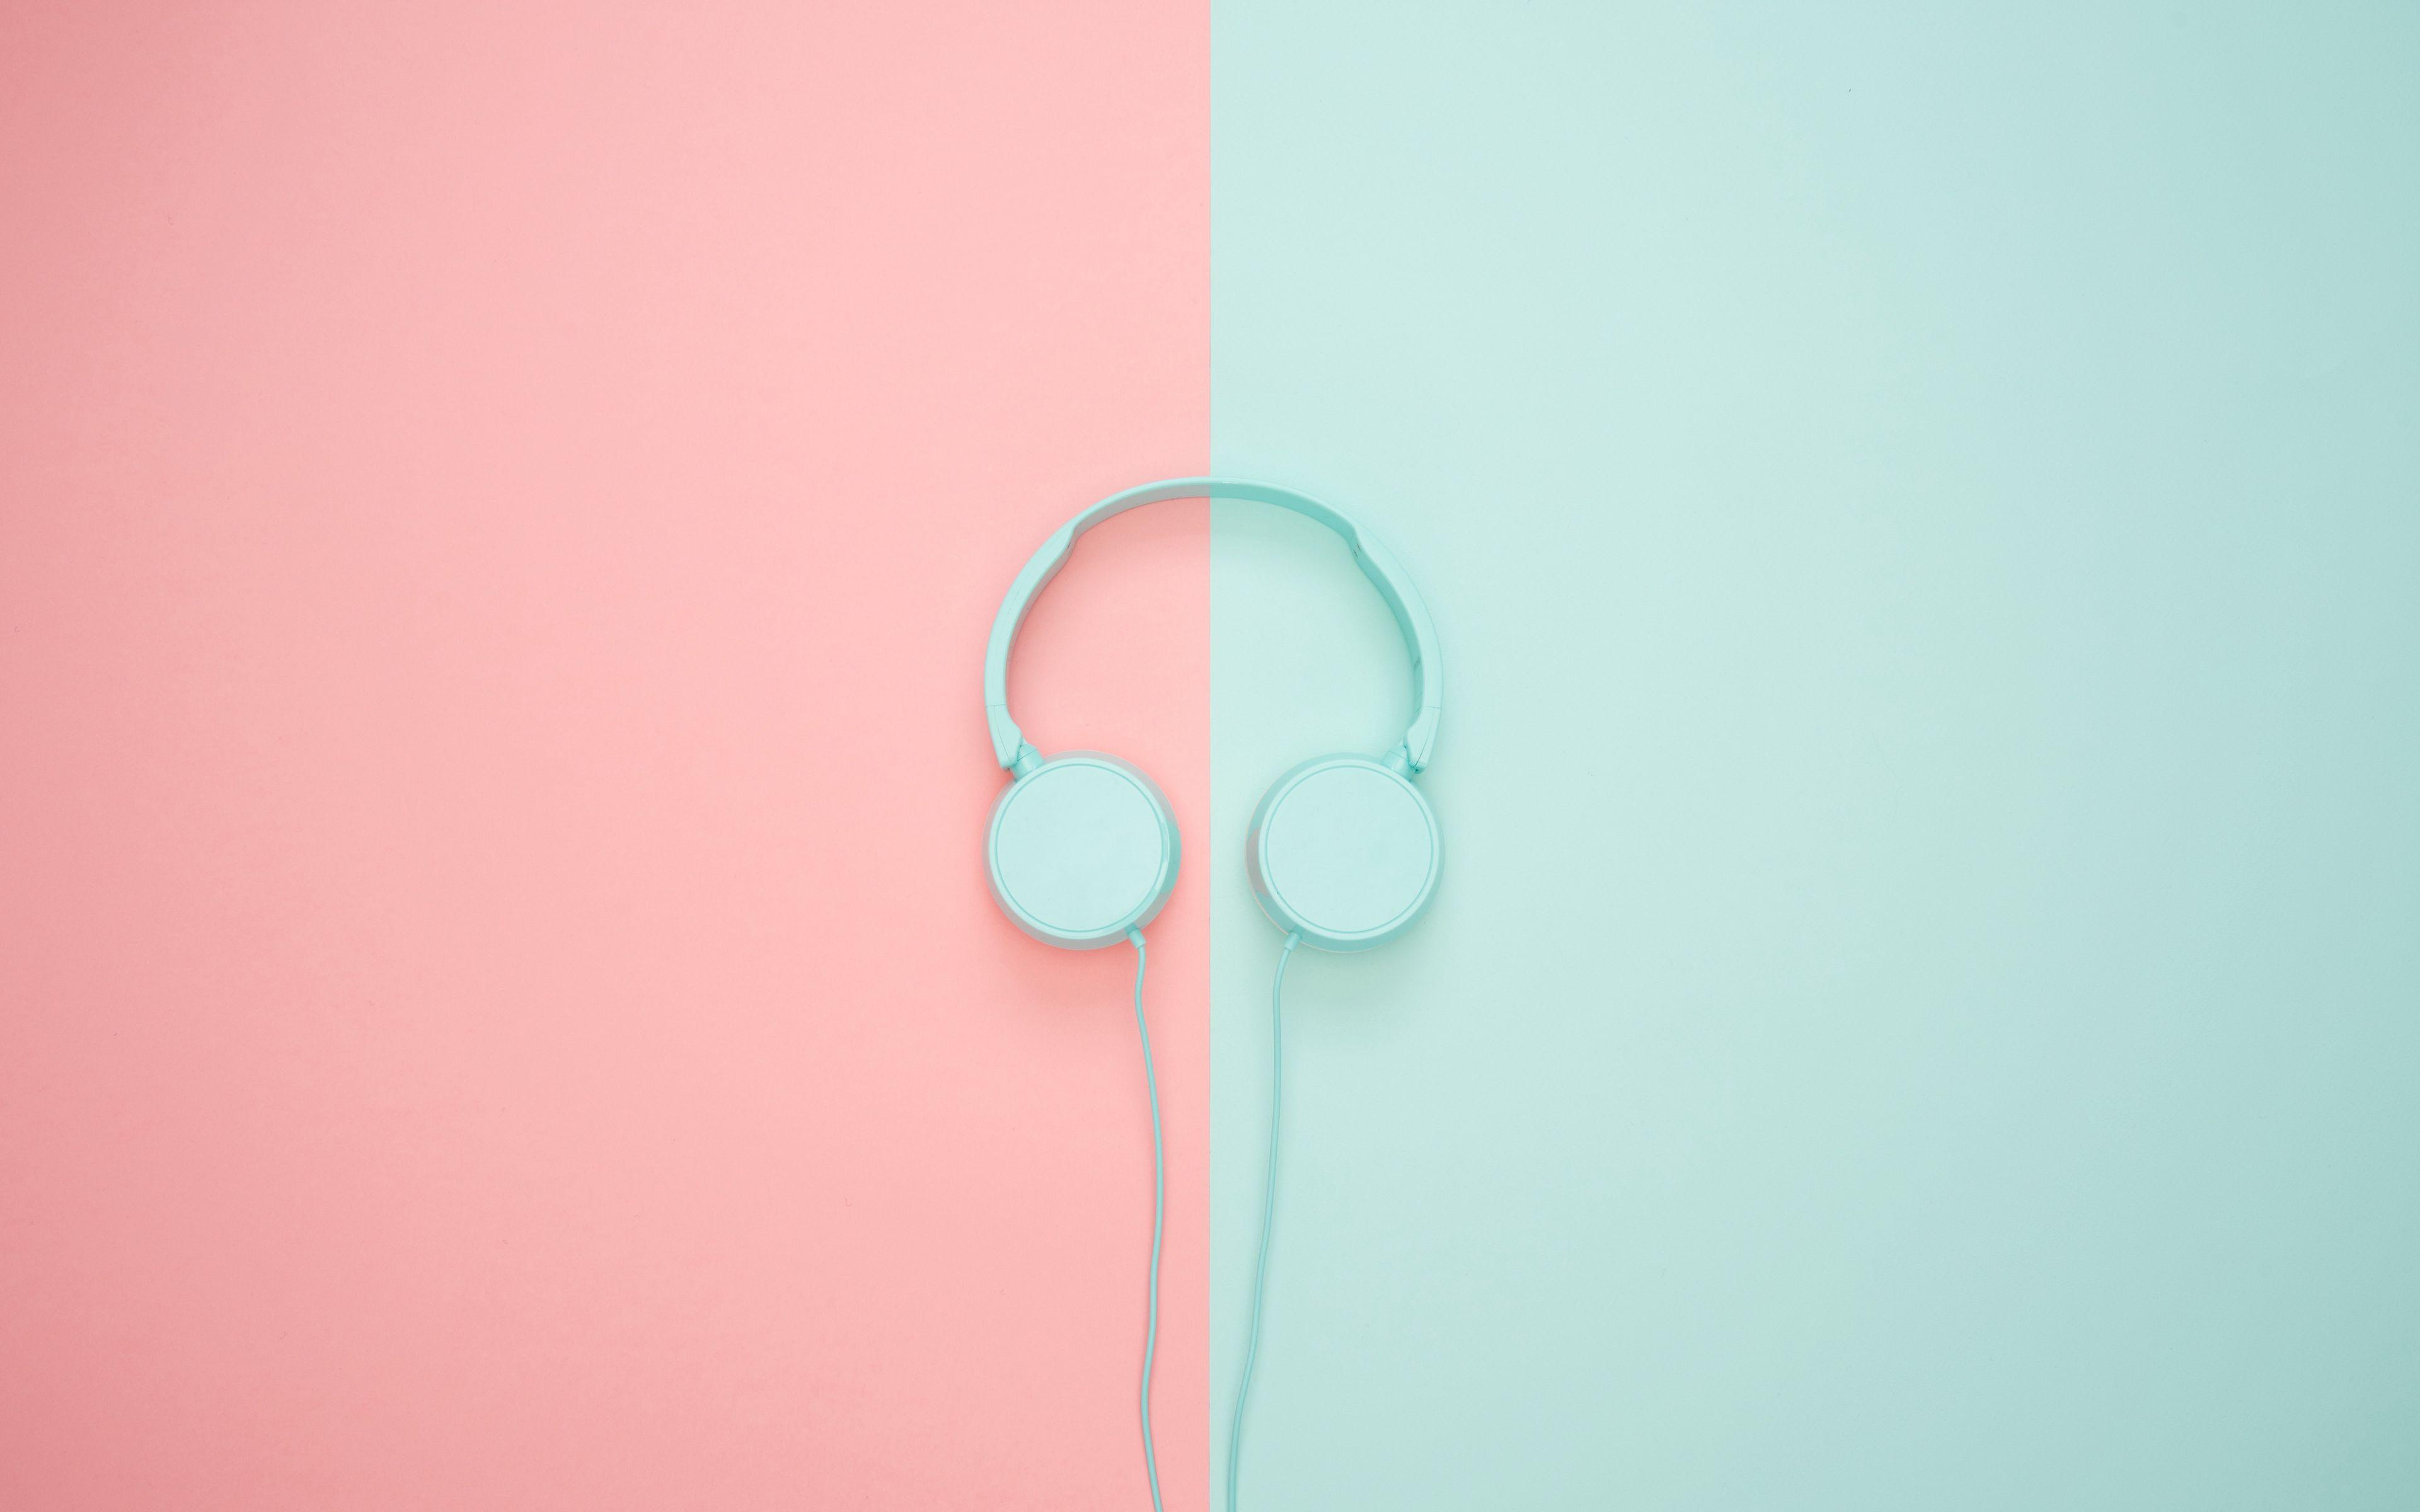 3840x2400 Wallpaper headphones, minimalism, pastel, pink